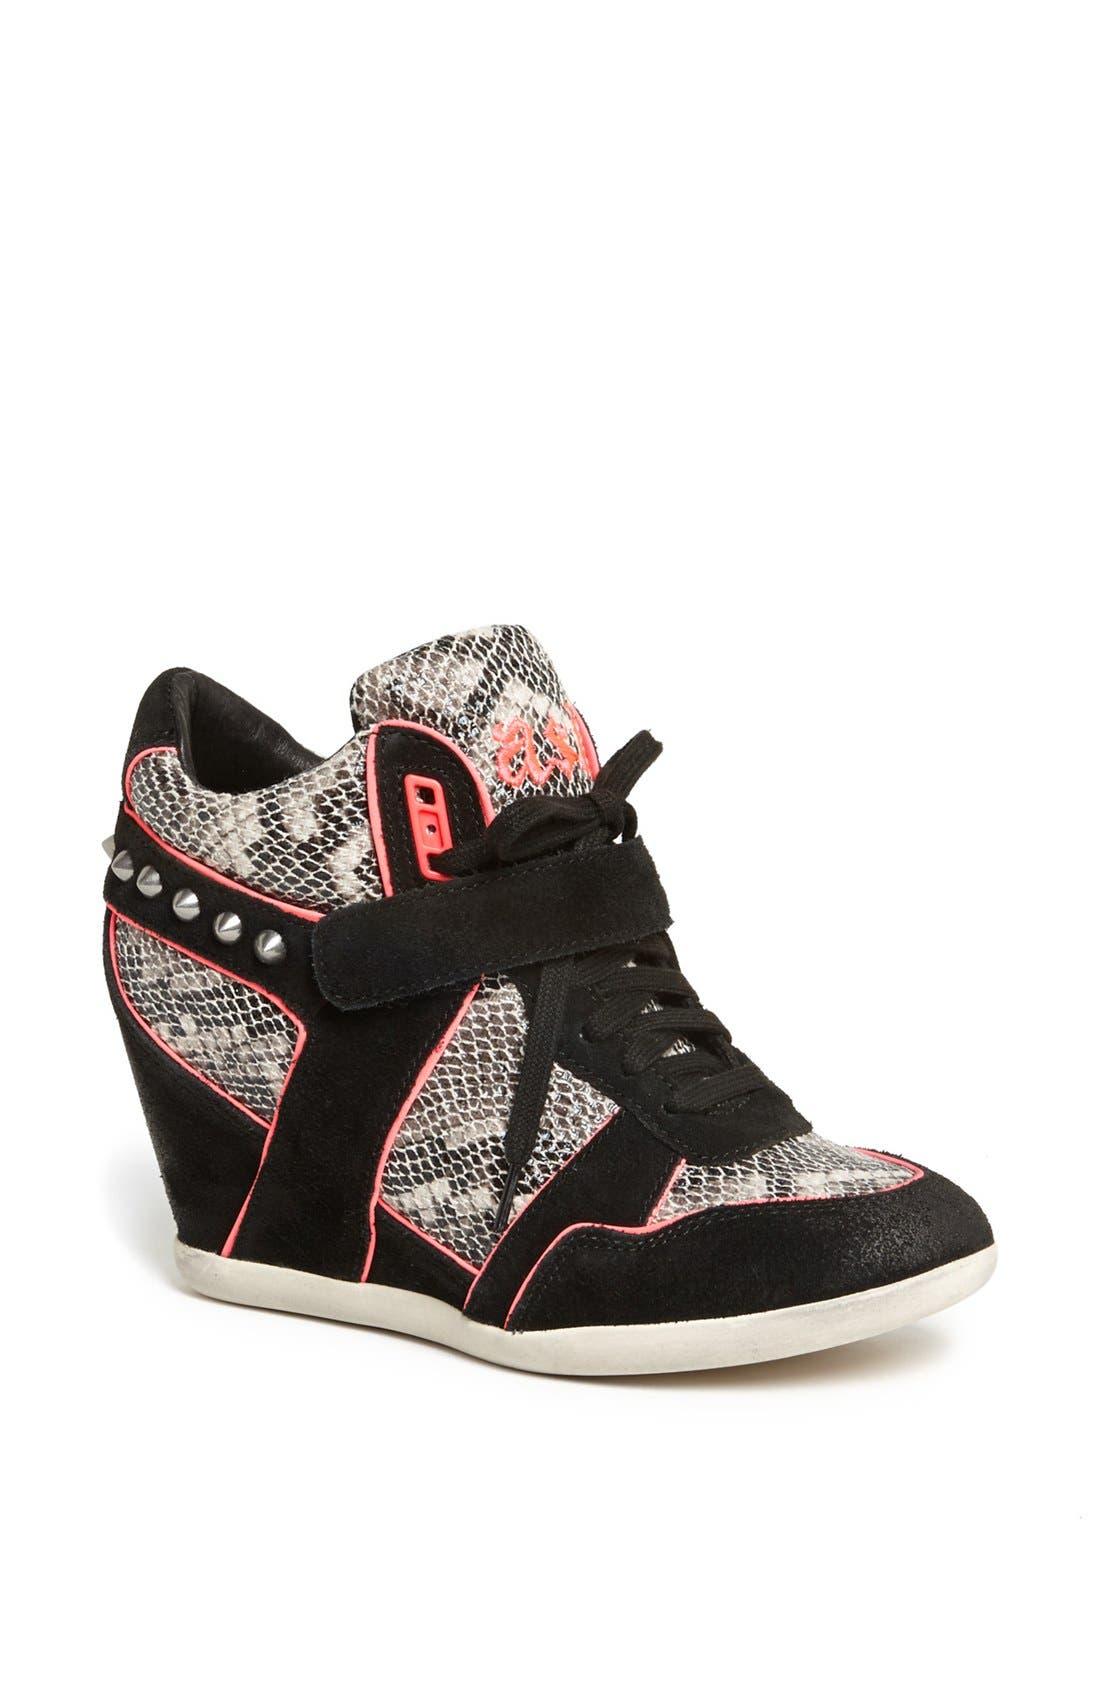 Main Image - Ash 'Bisou' Spike Studded Hidden Wedge Sneaker